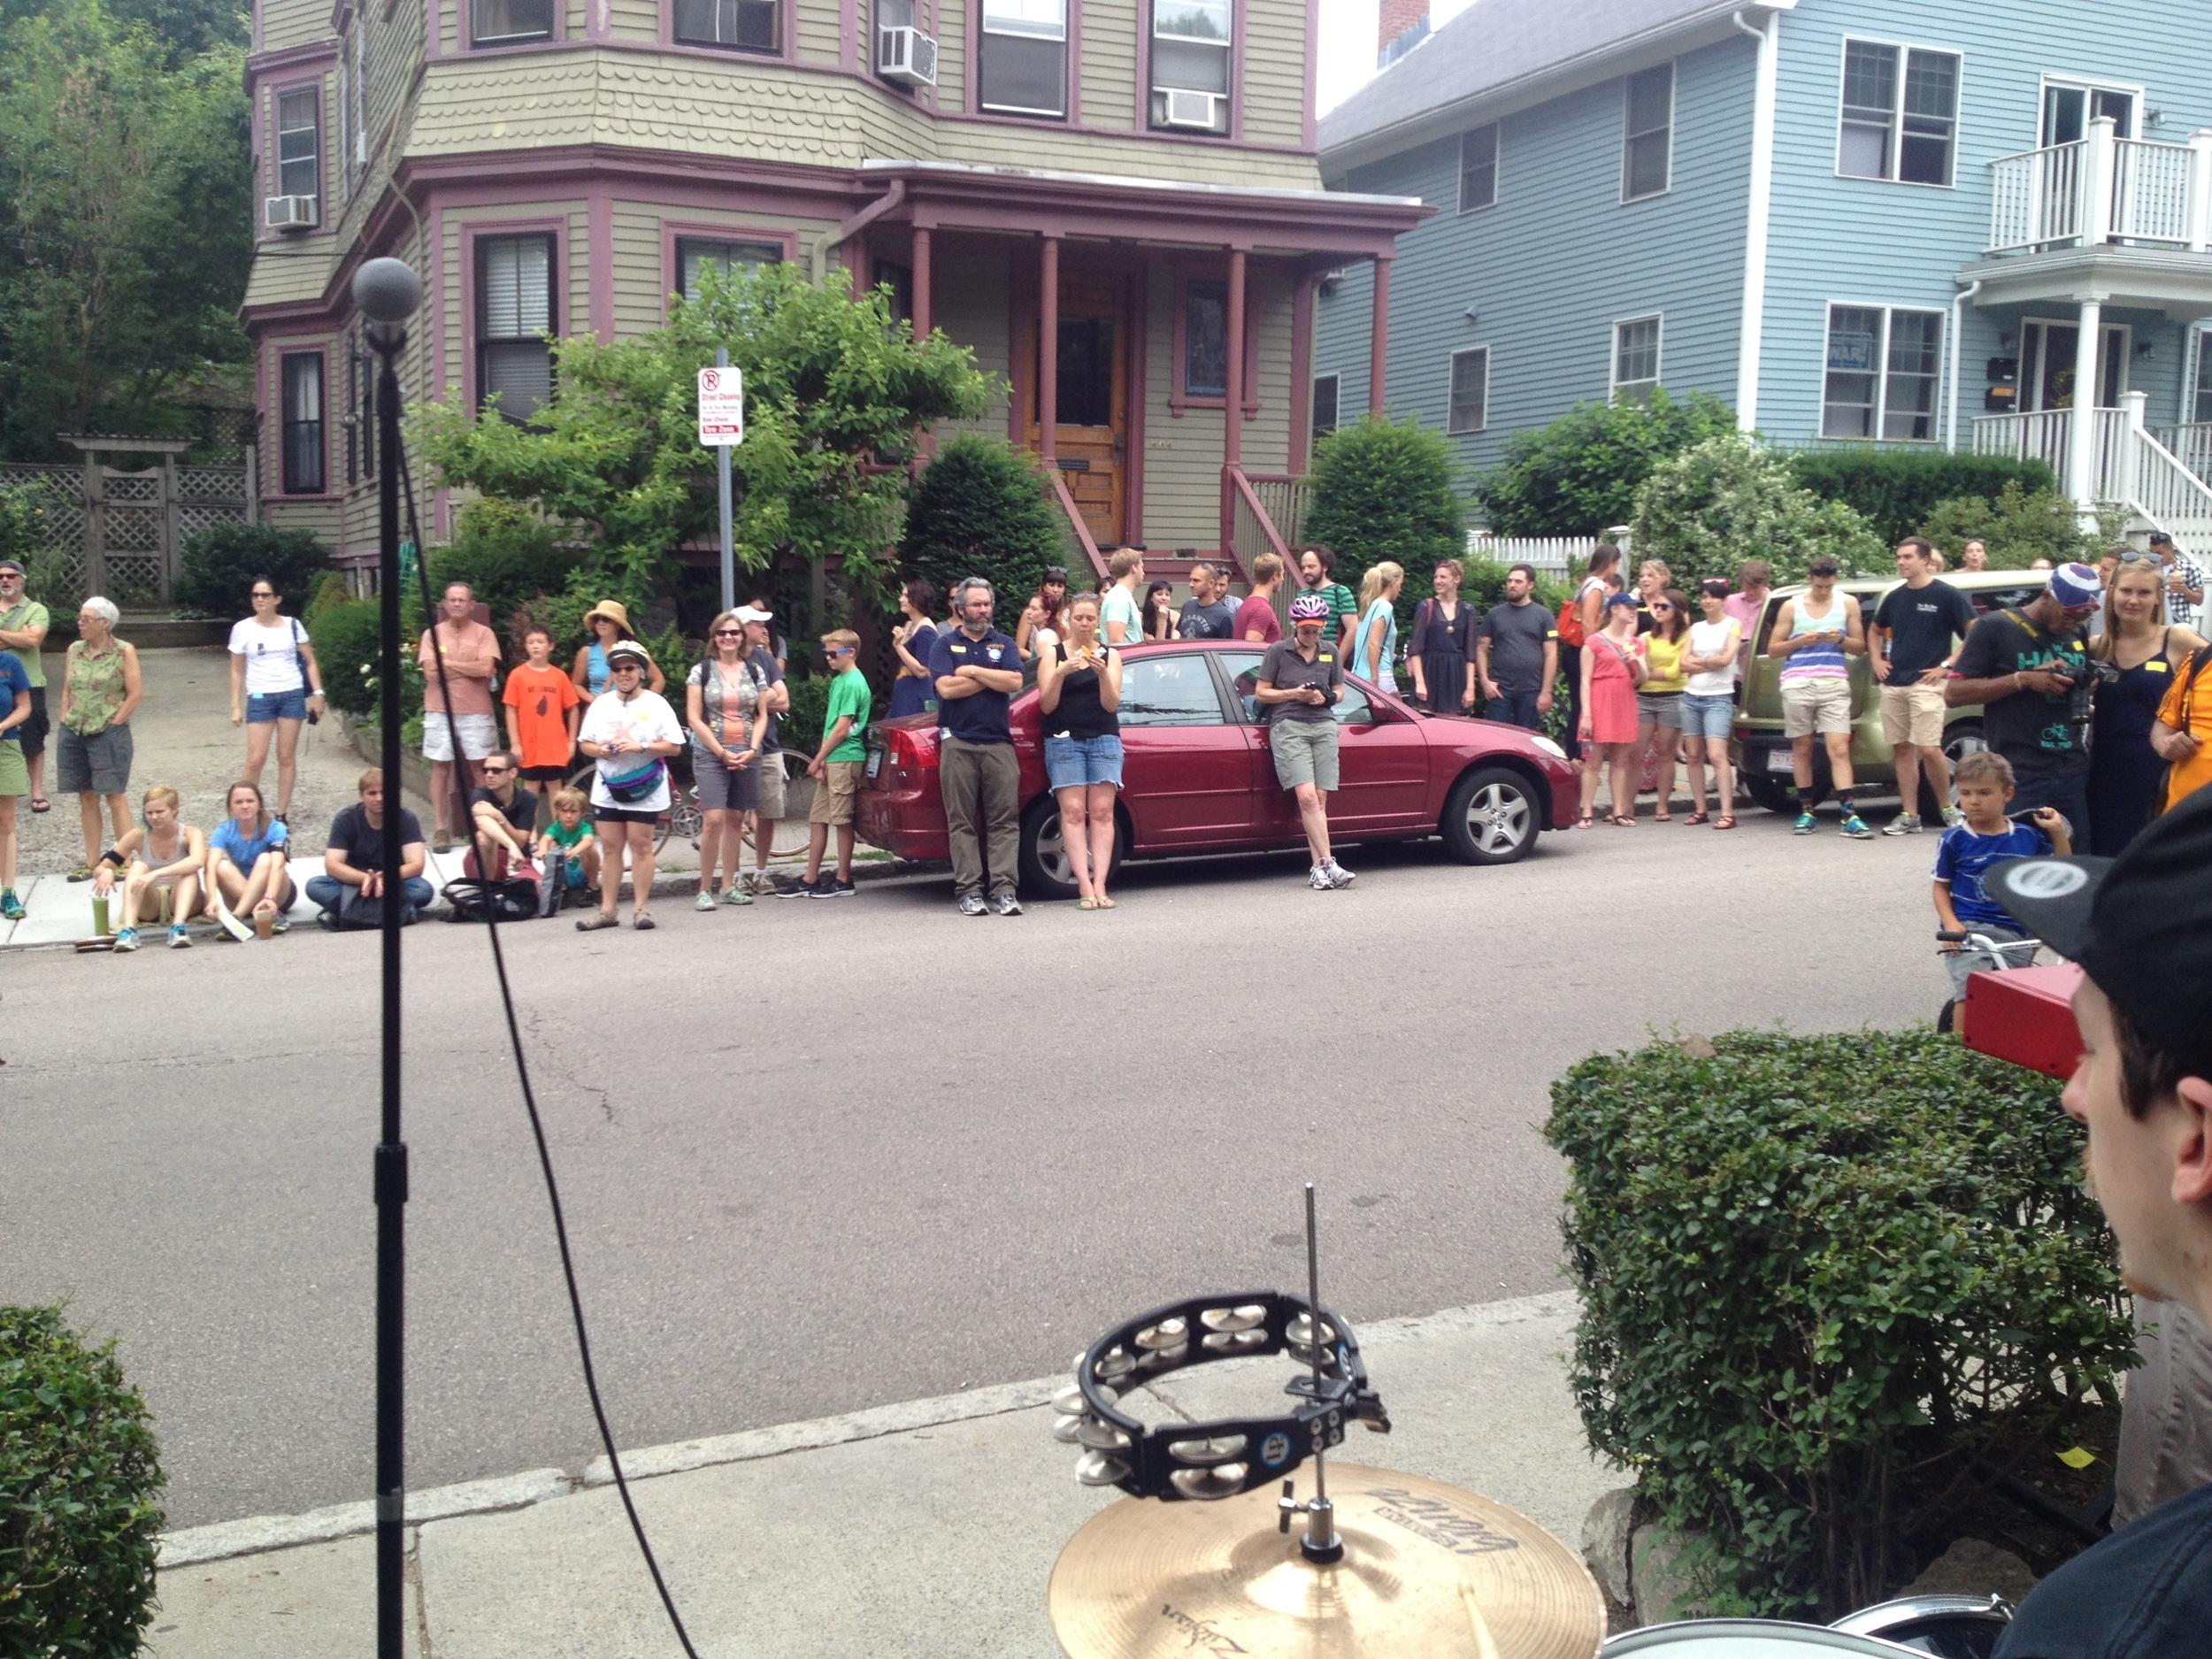 crowd 11.jpg